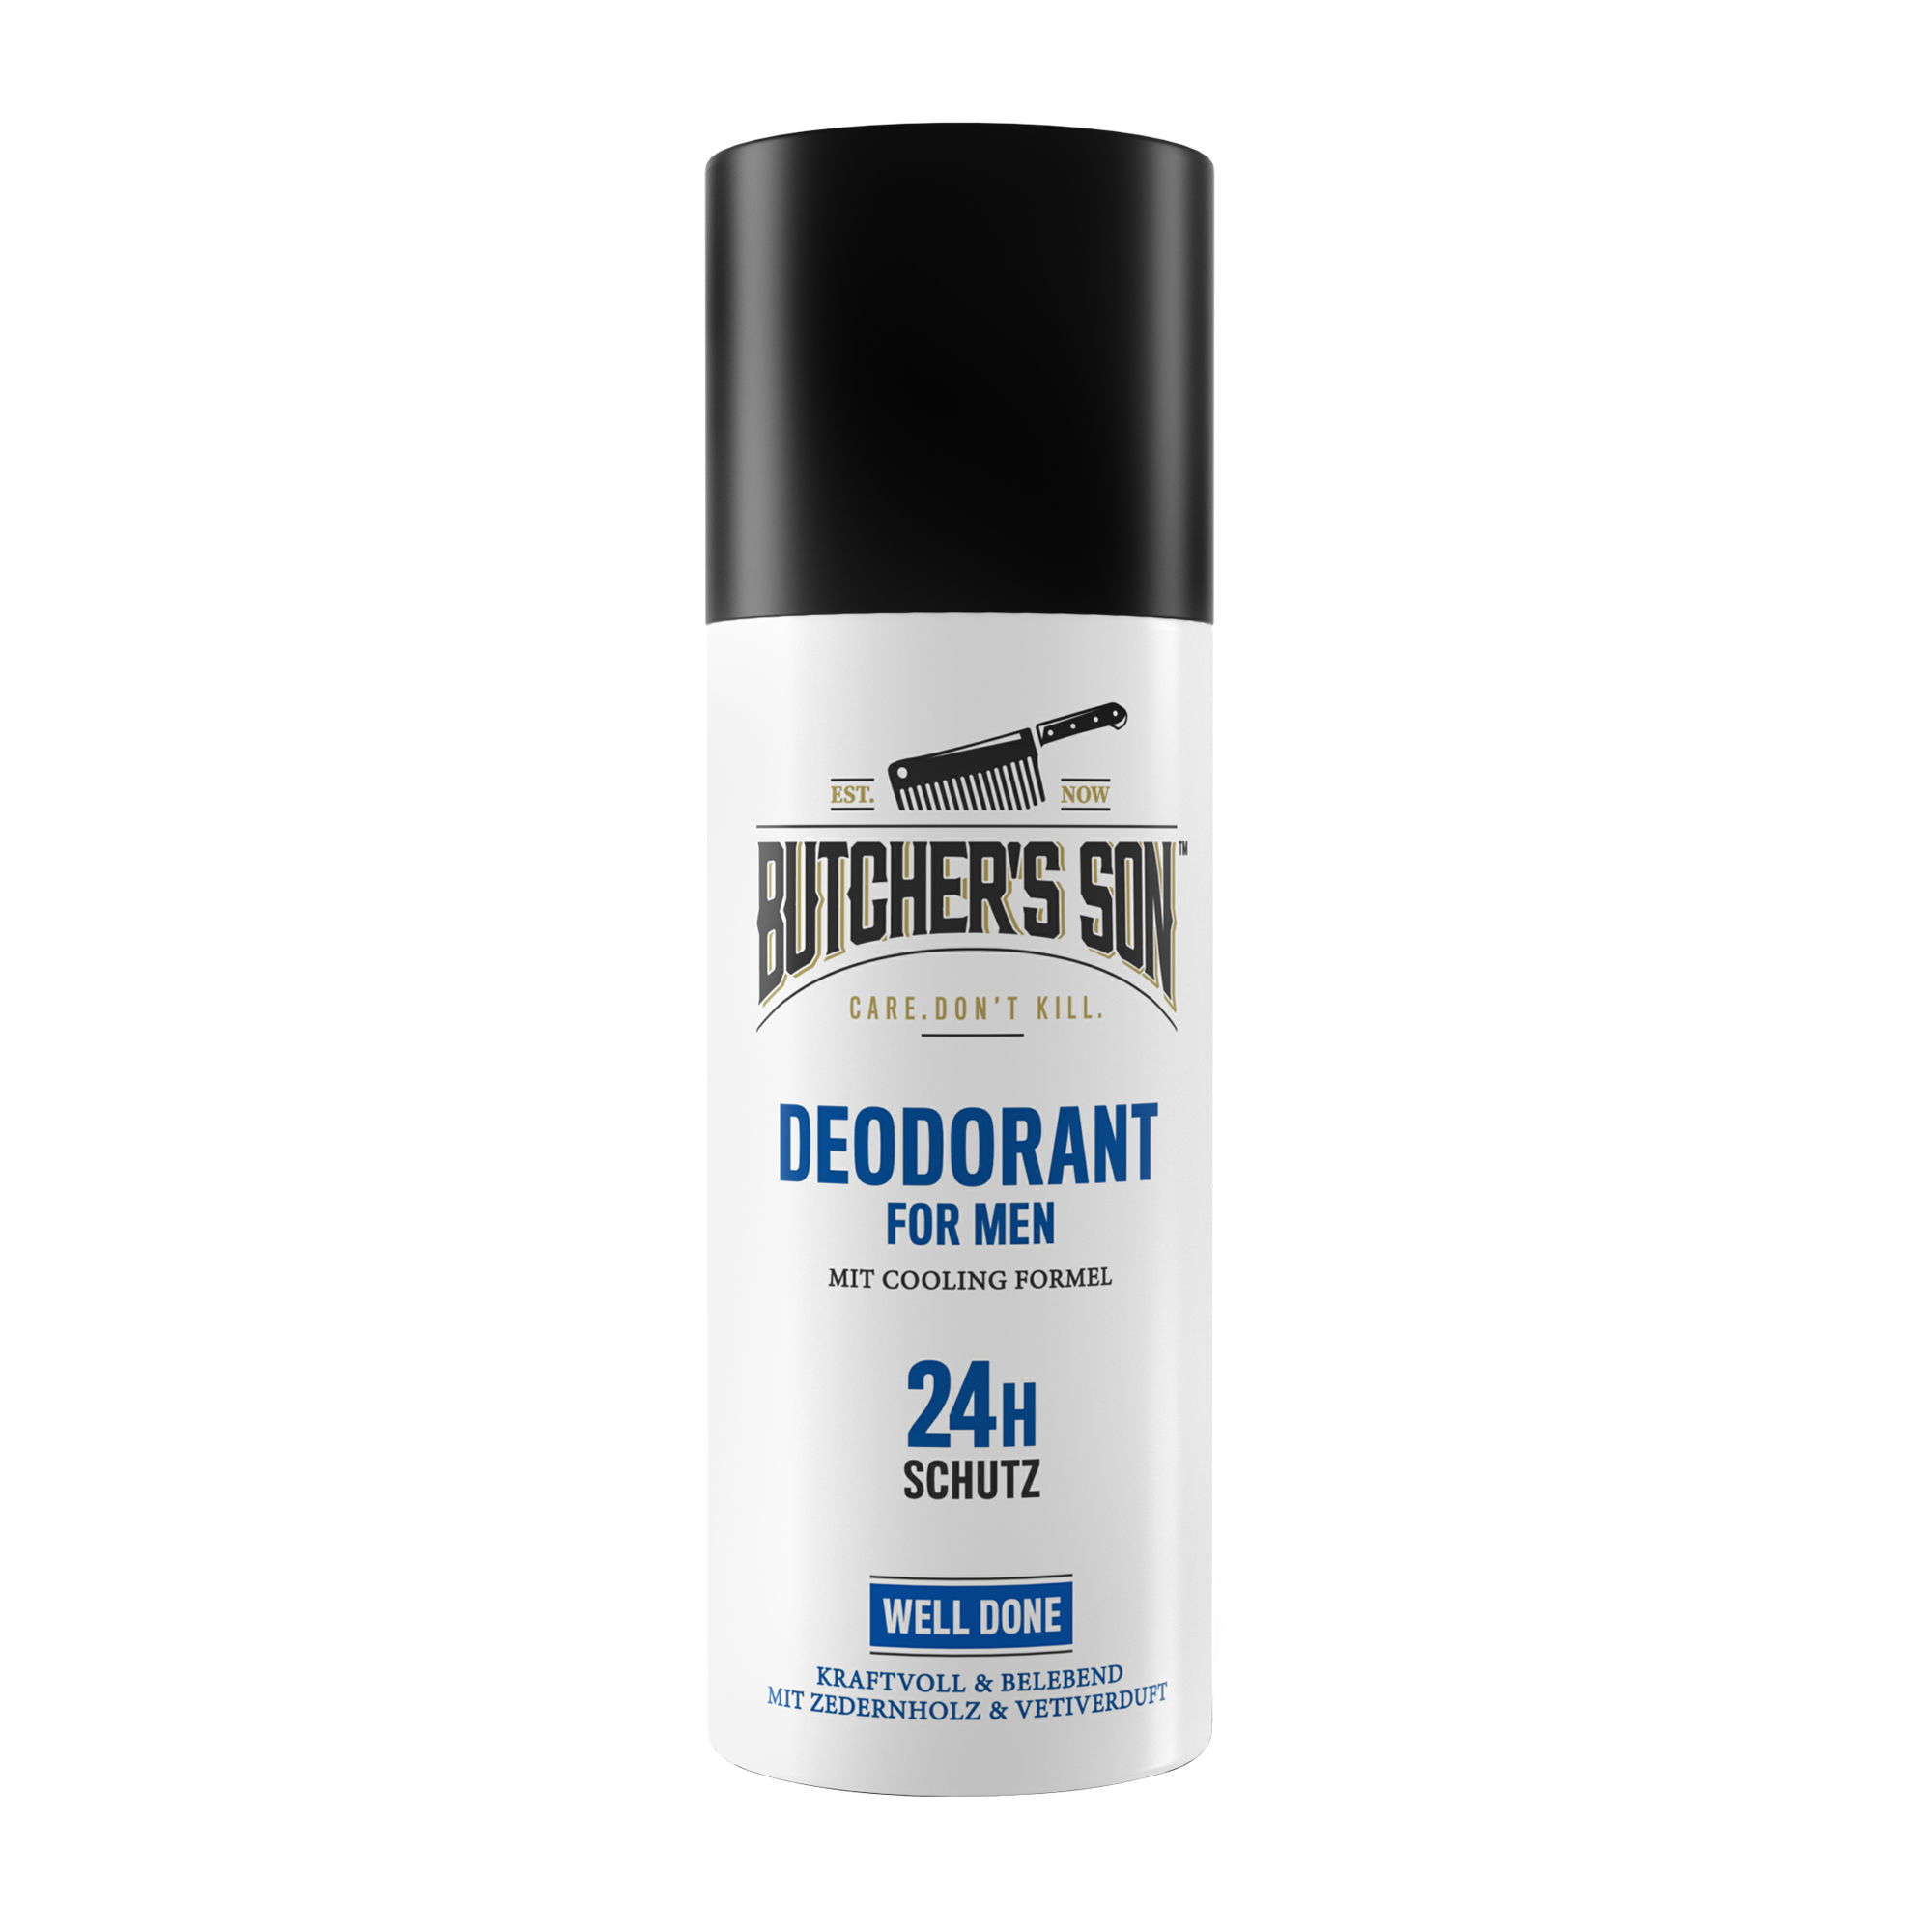 Butcher's Son Deodorant Spray Well Done